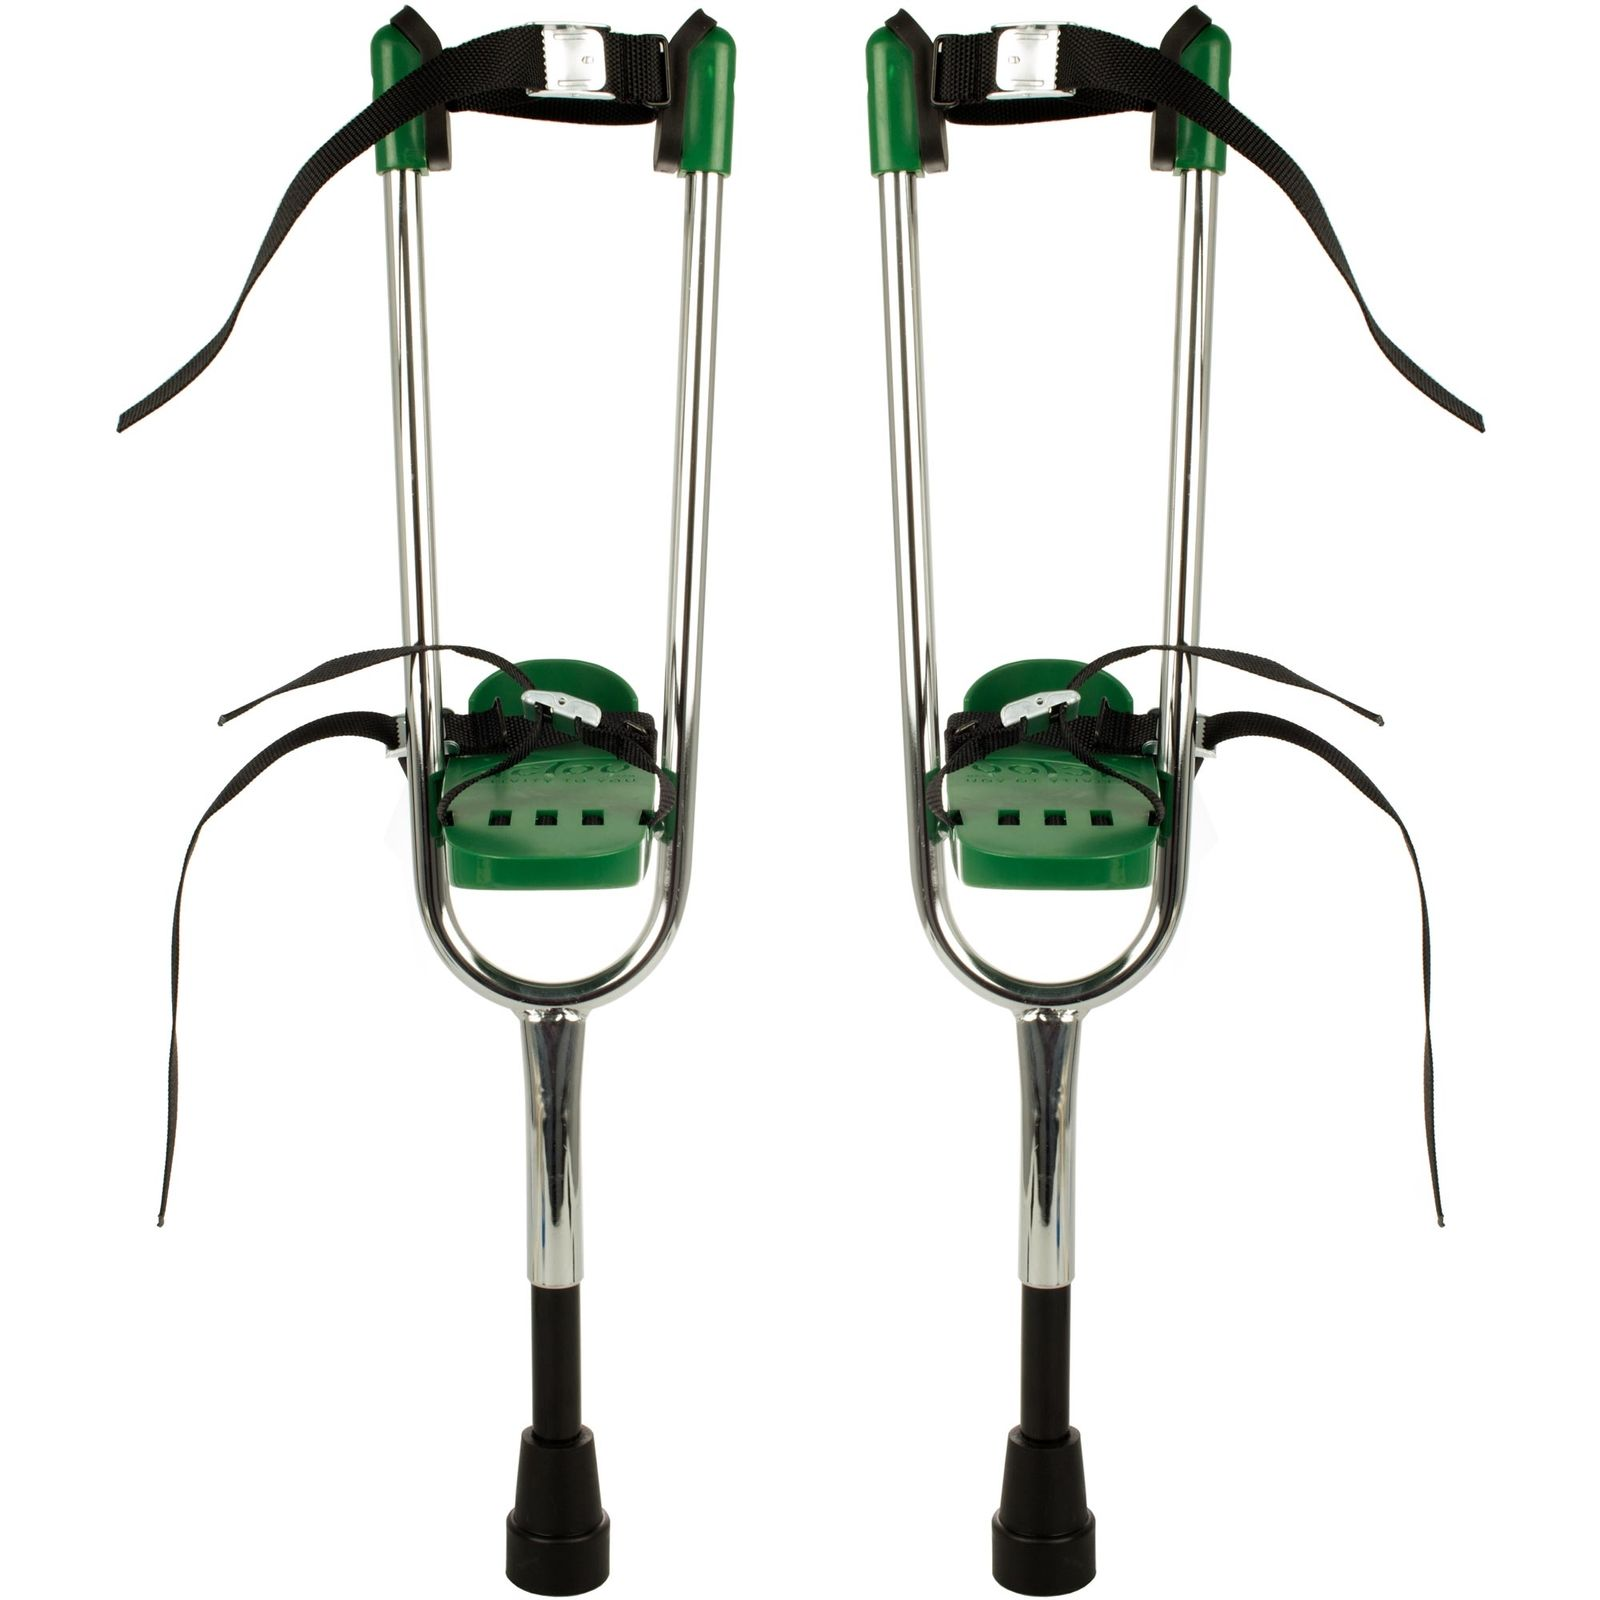 Actoy - Kid's Peg Stilts - Green (s1000)